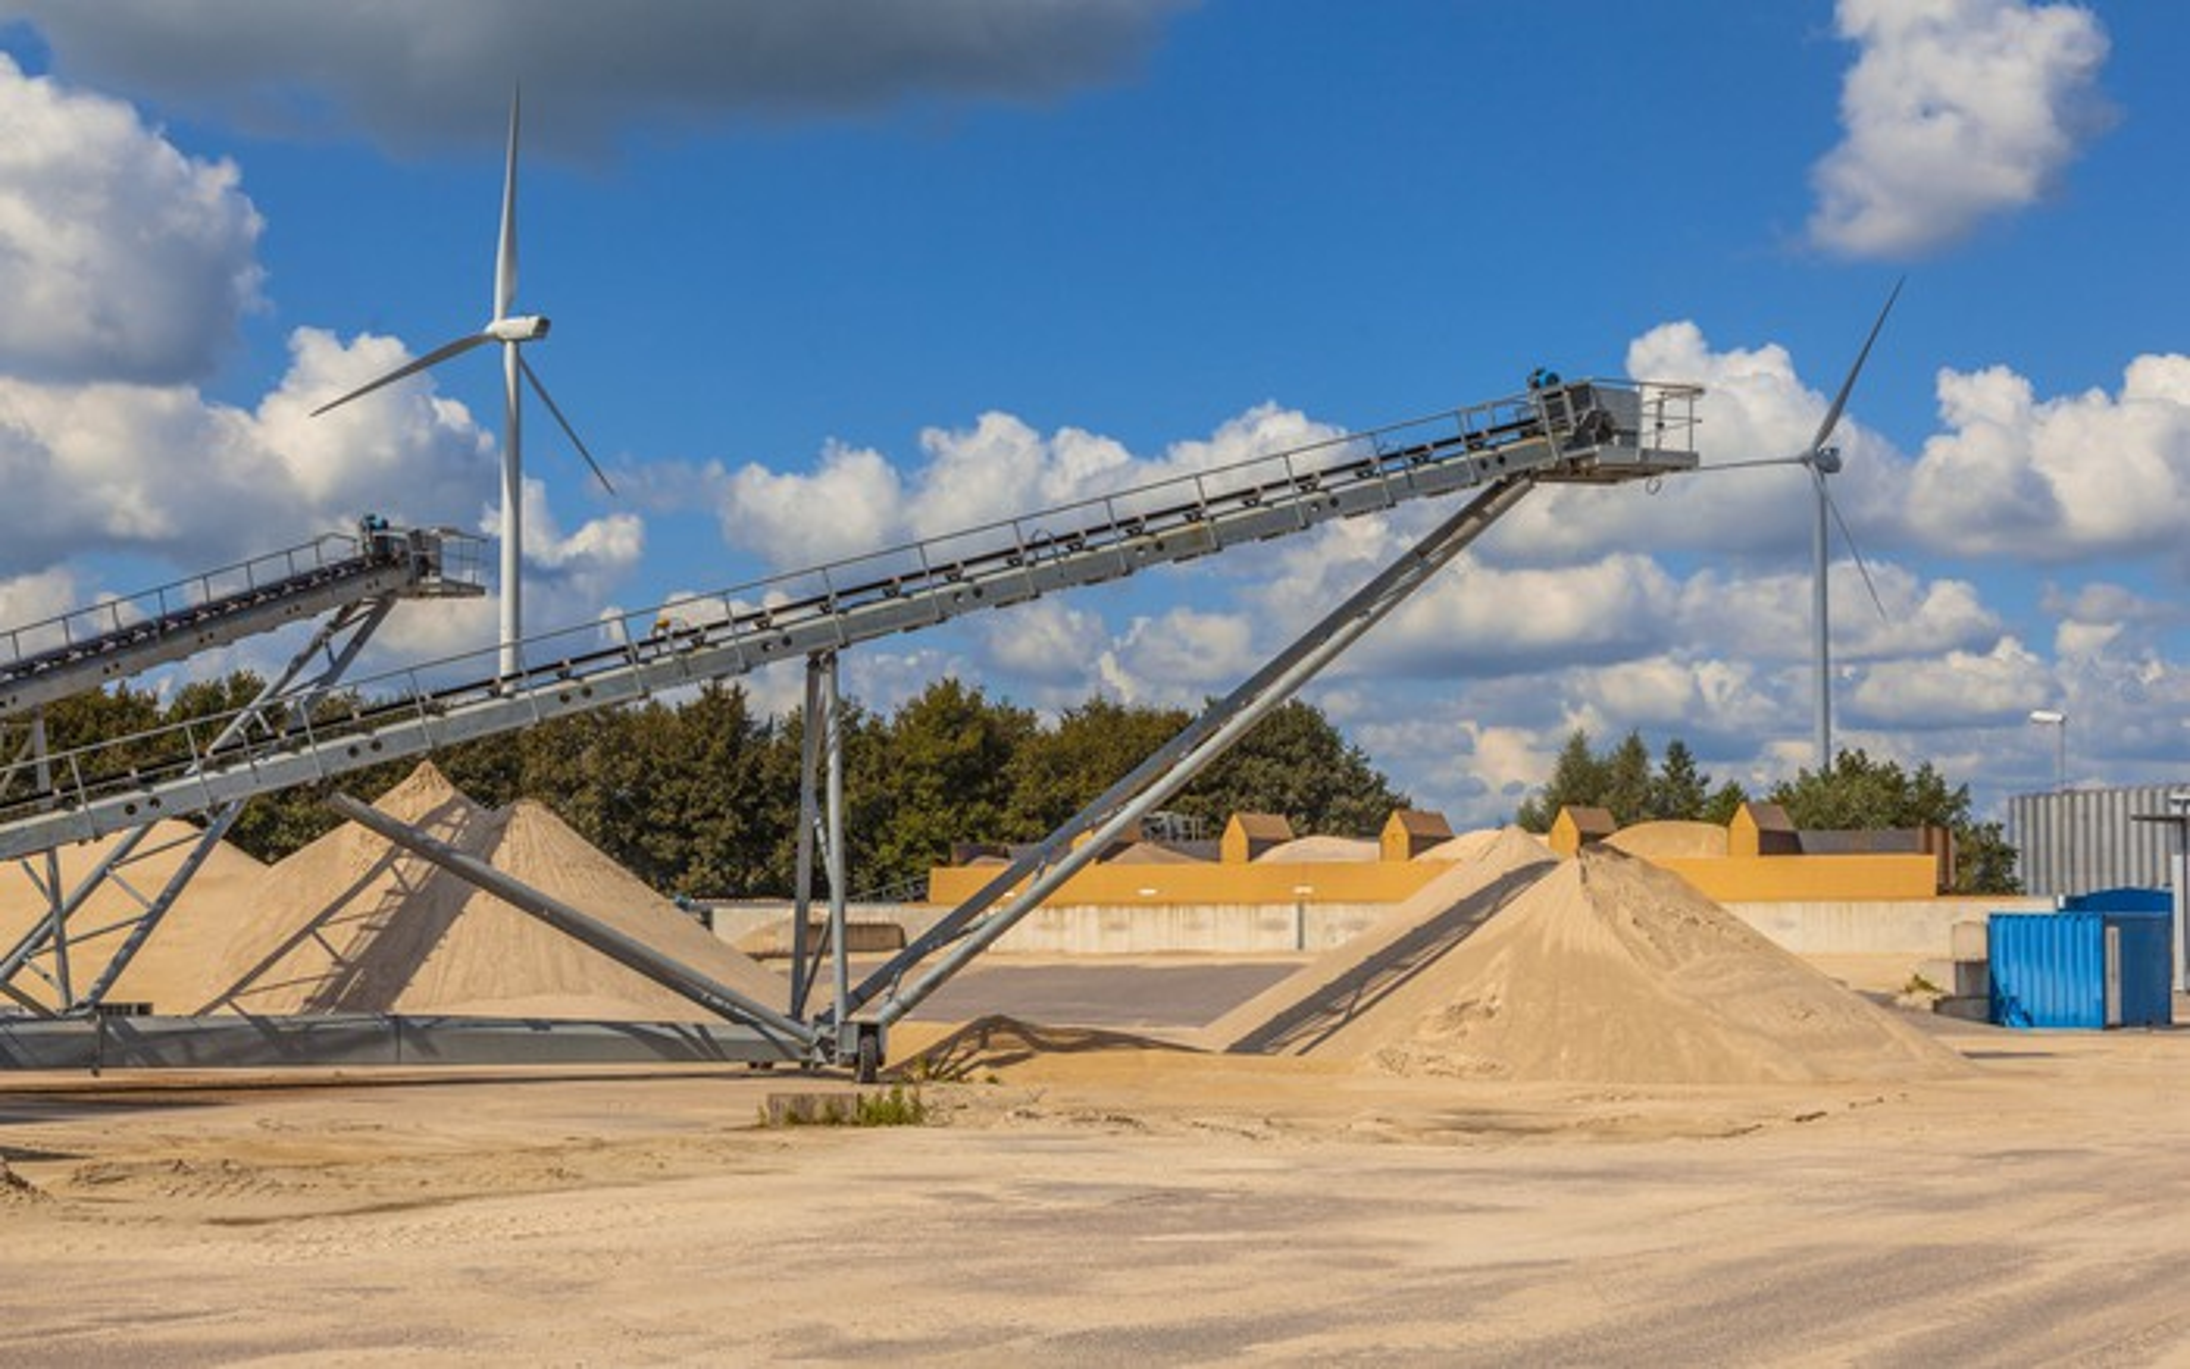 Sand mine equipment.